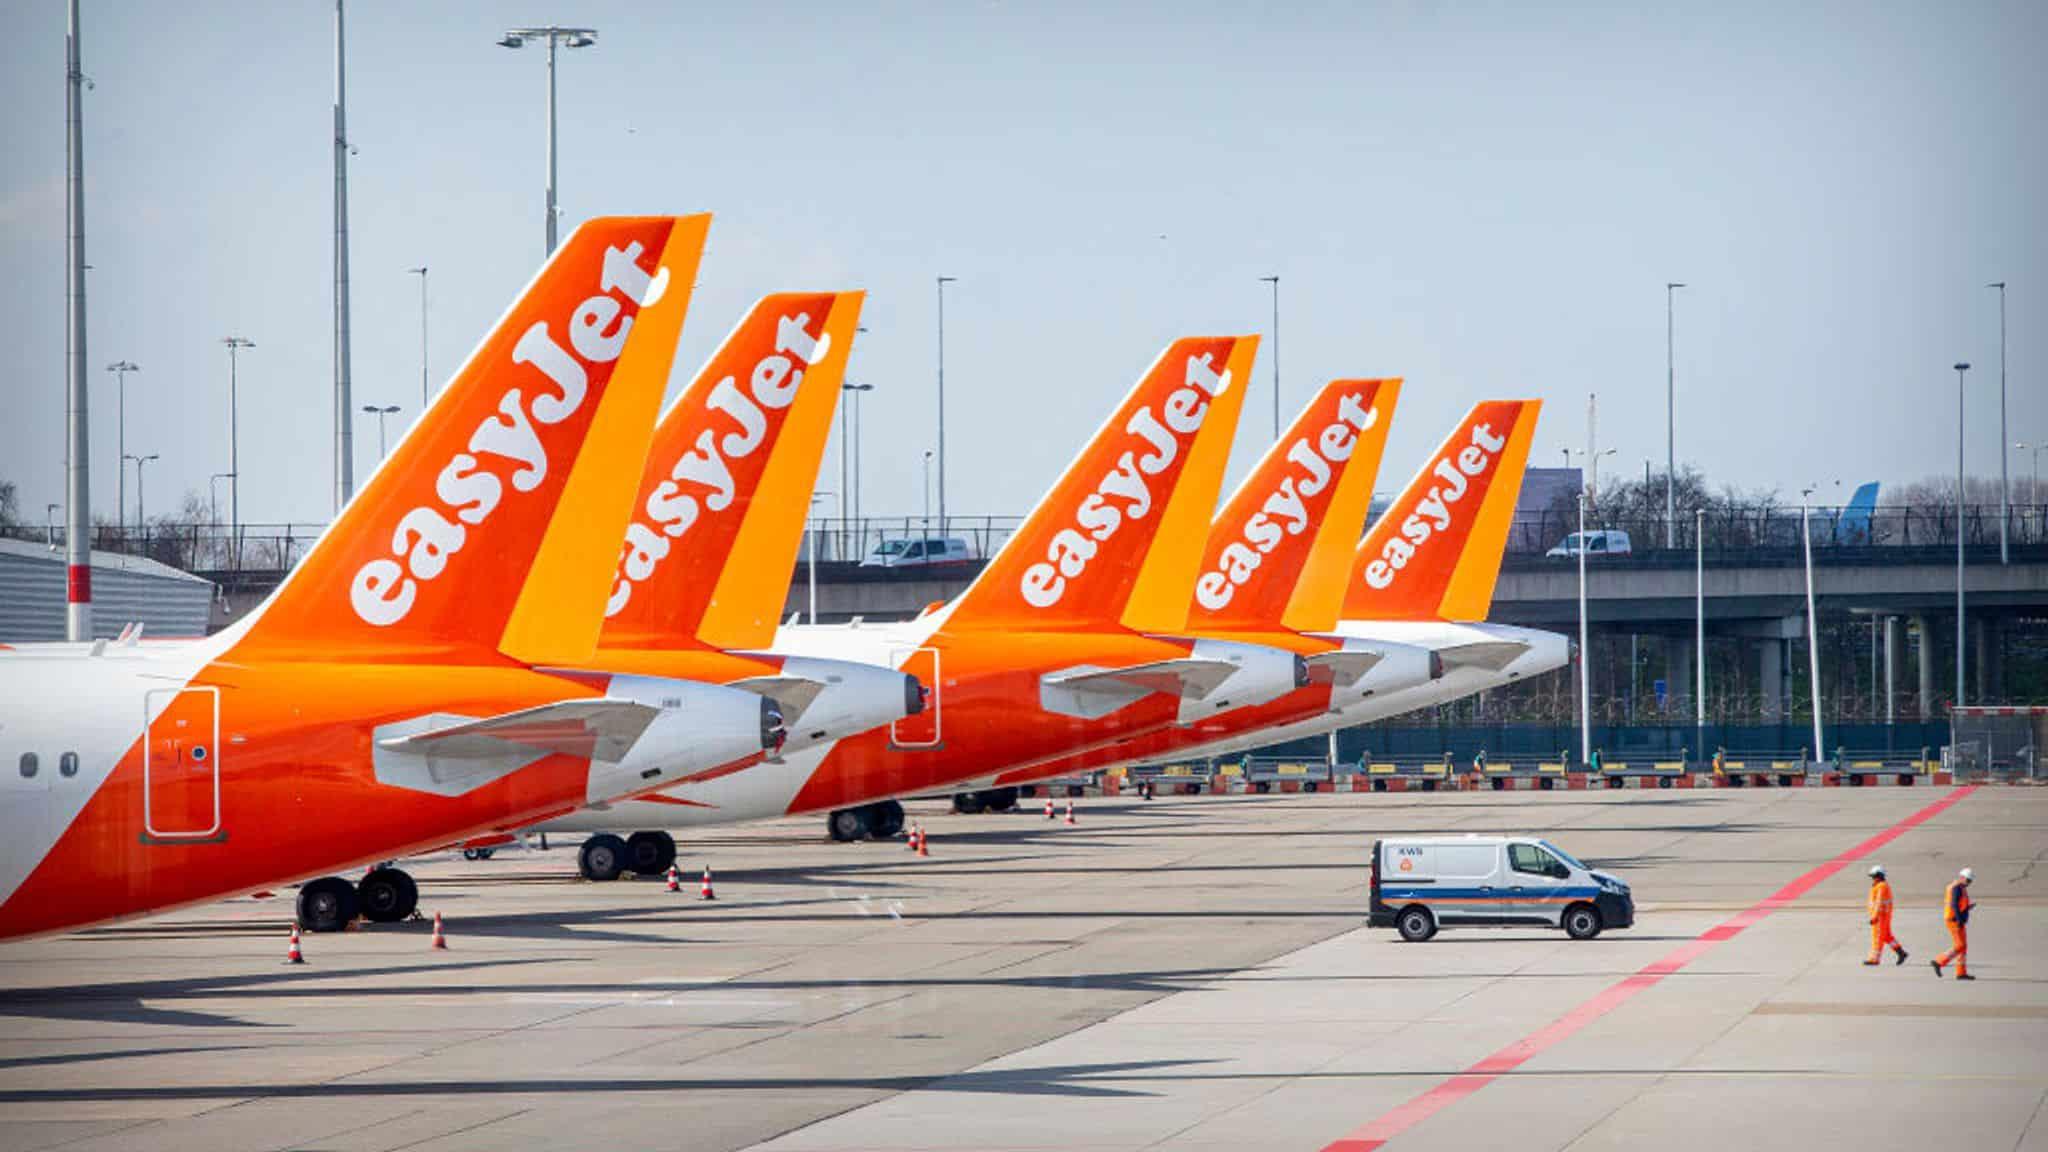 EasyJet will dress flight attendants and pilots in the uniform made of plastic bottles